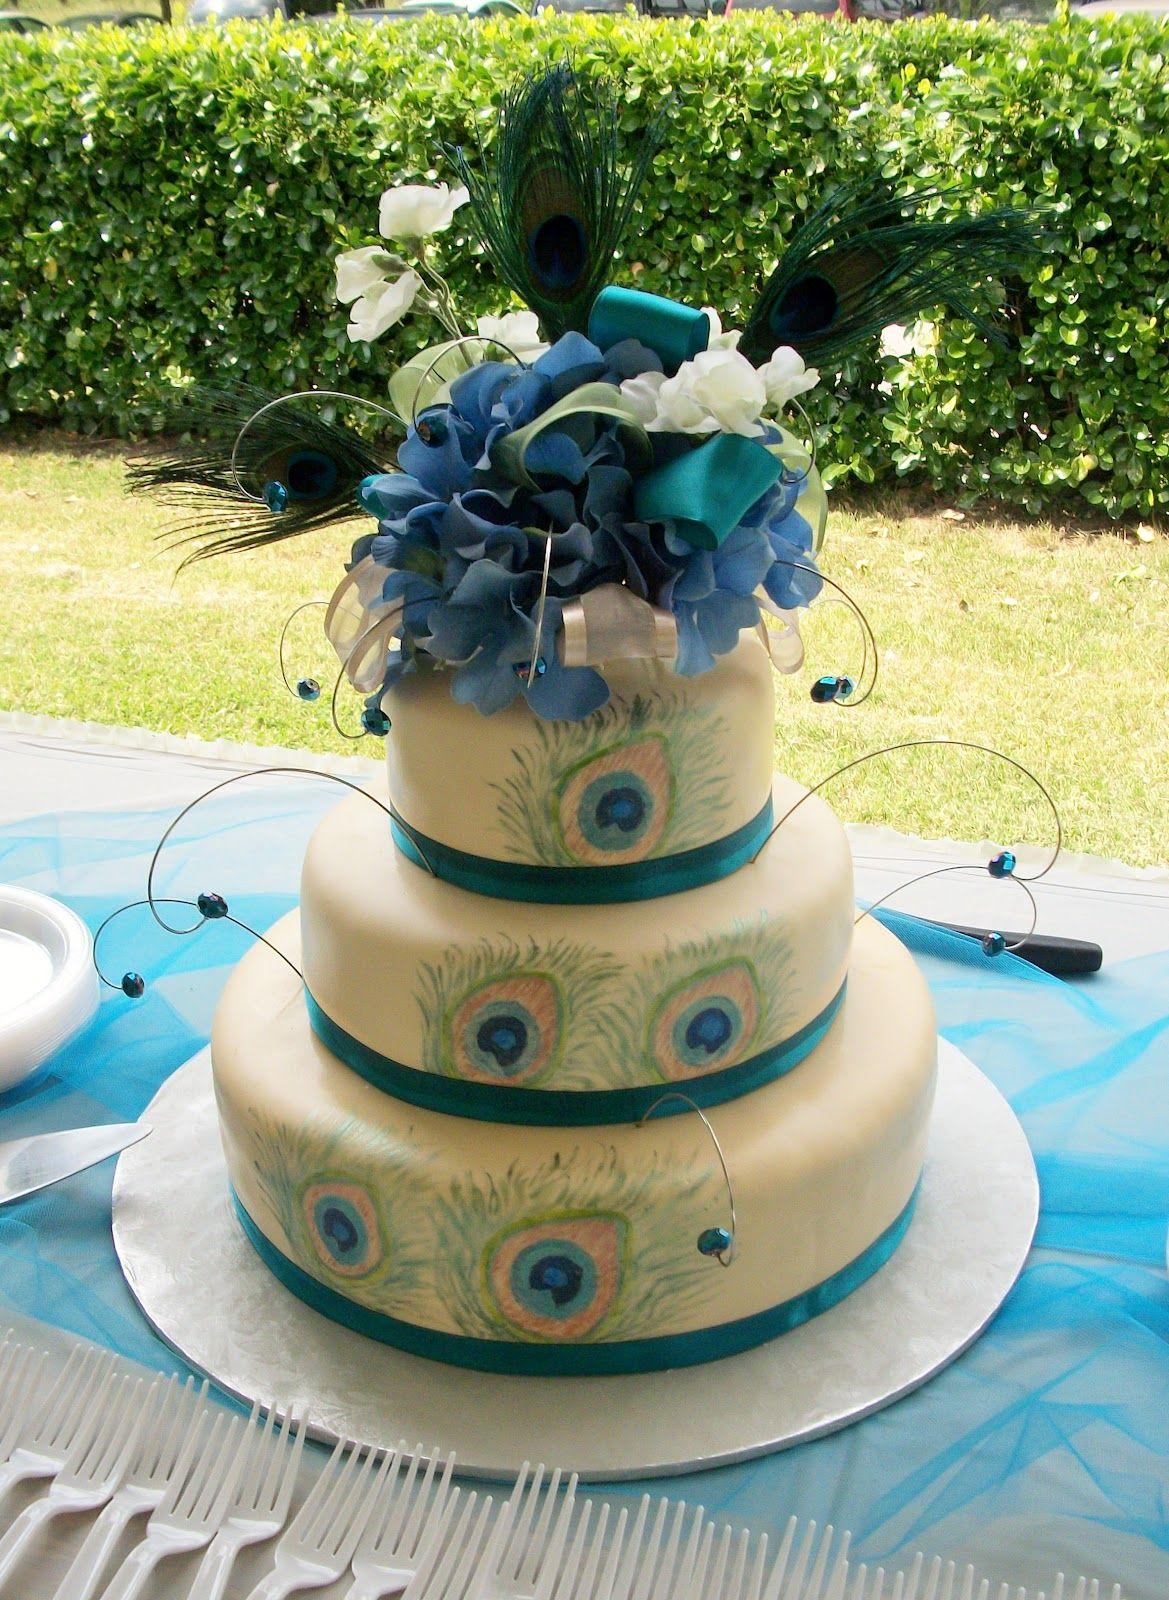 Square Peacock Wedding Cake